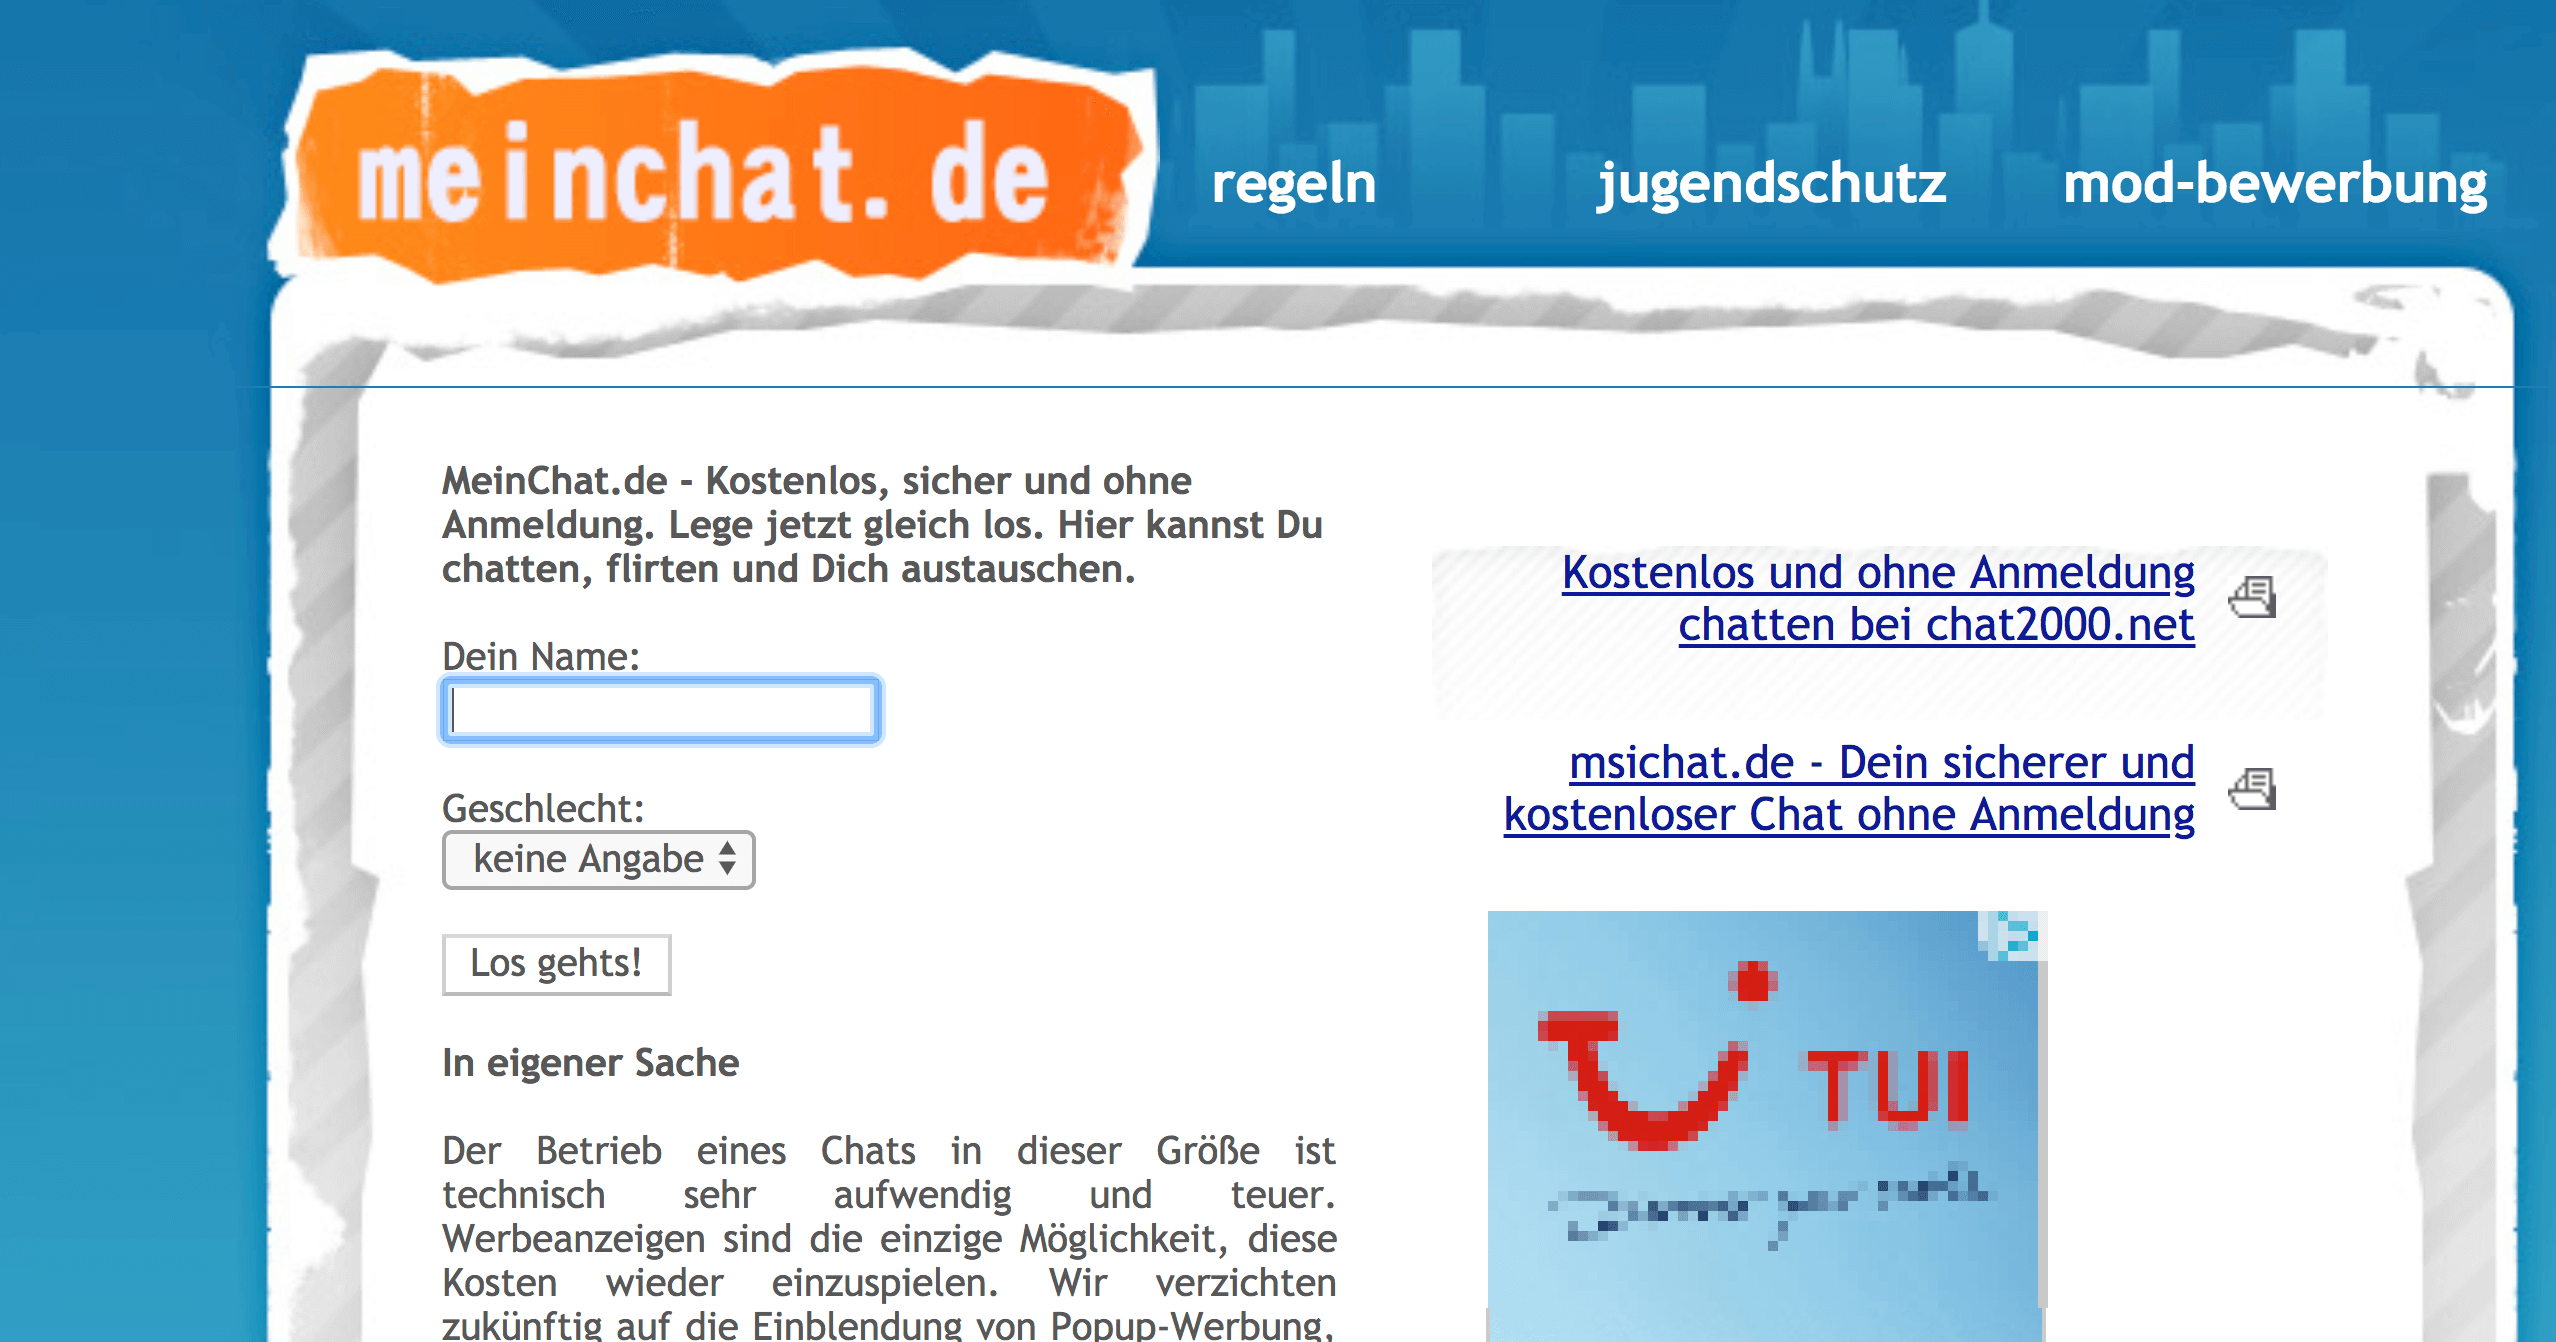 Anmeldung chat2000 ohne CHATROOM2000 ALTERNATIVE